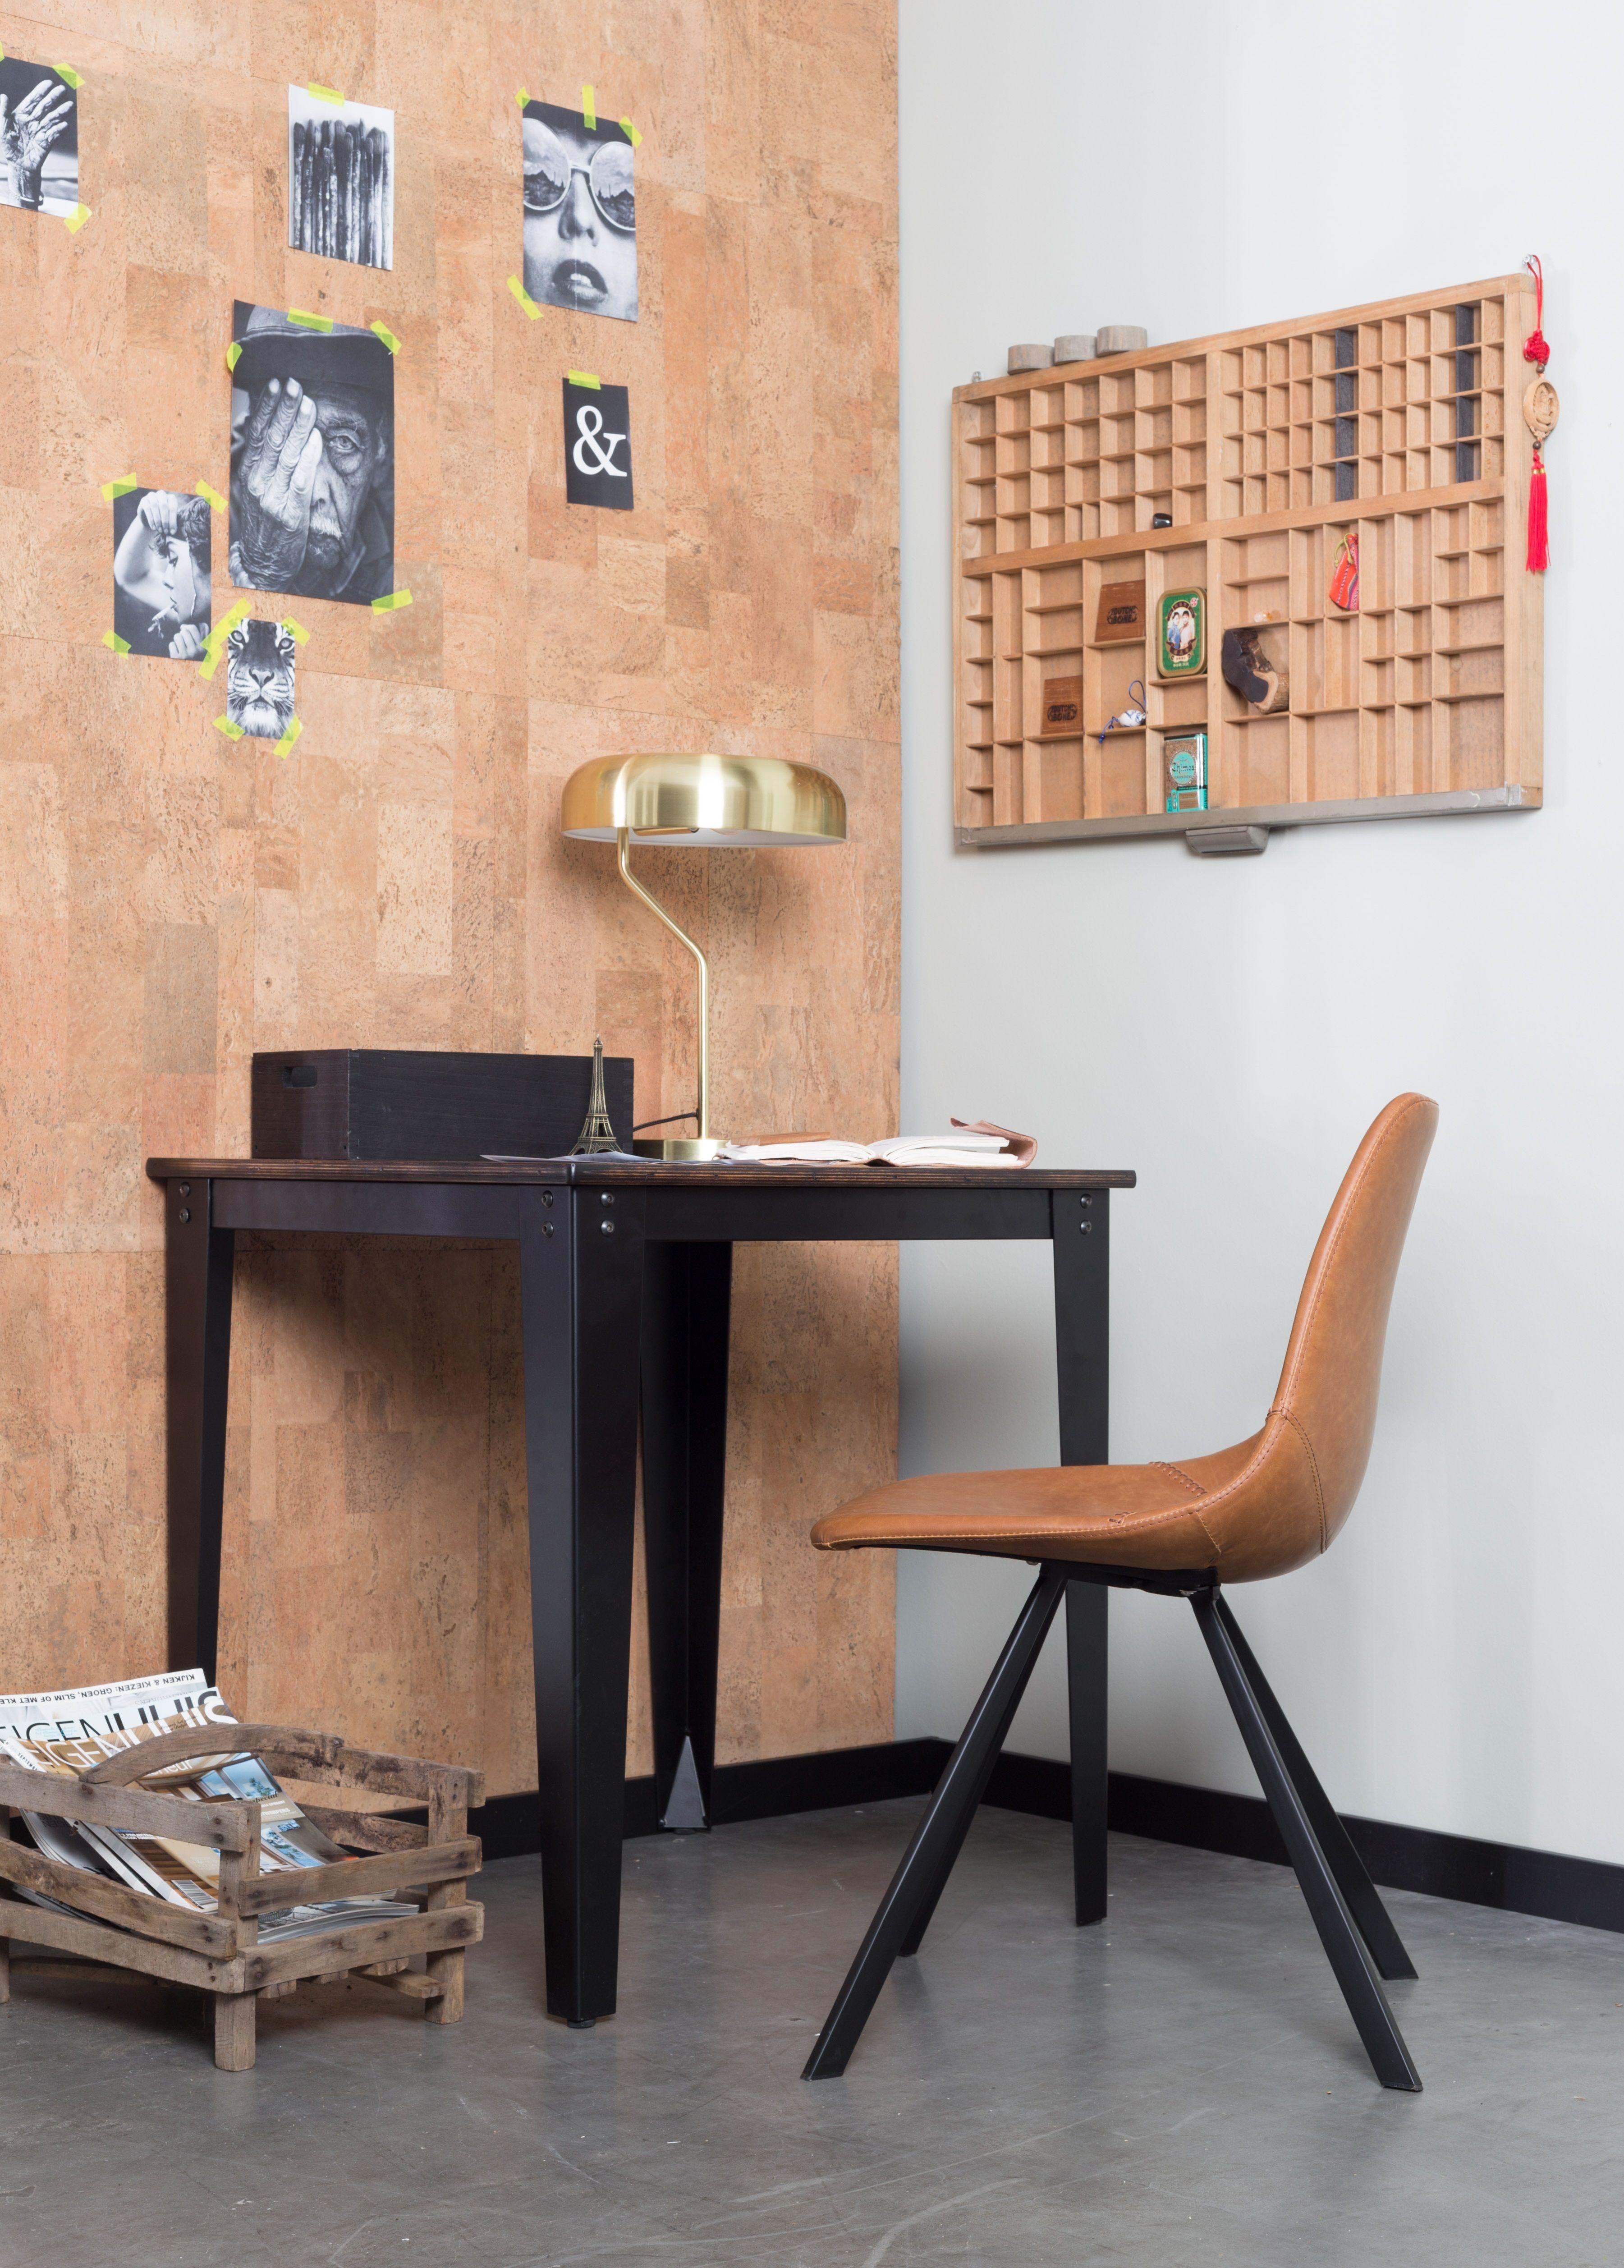 Dutchbone - Franky Spisebordsstol - Brun - Brun spisebordsstol